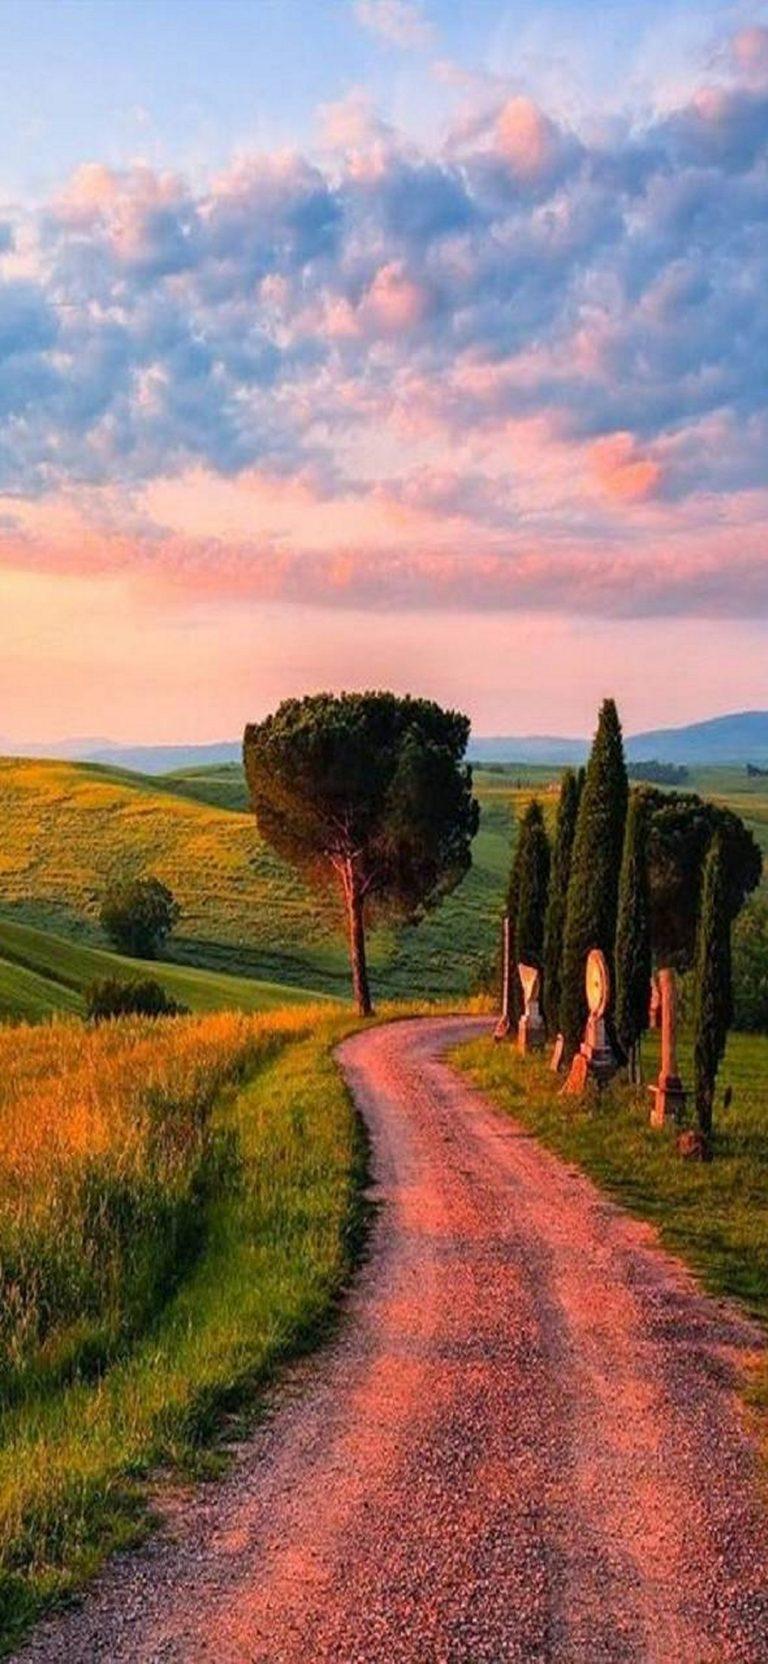 Landscape Phone Wallpaper 076 1080x2340 768x1664